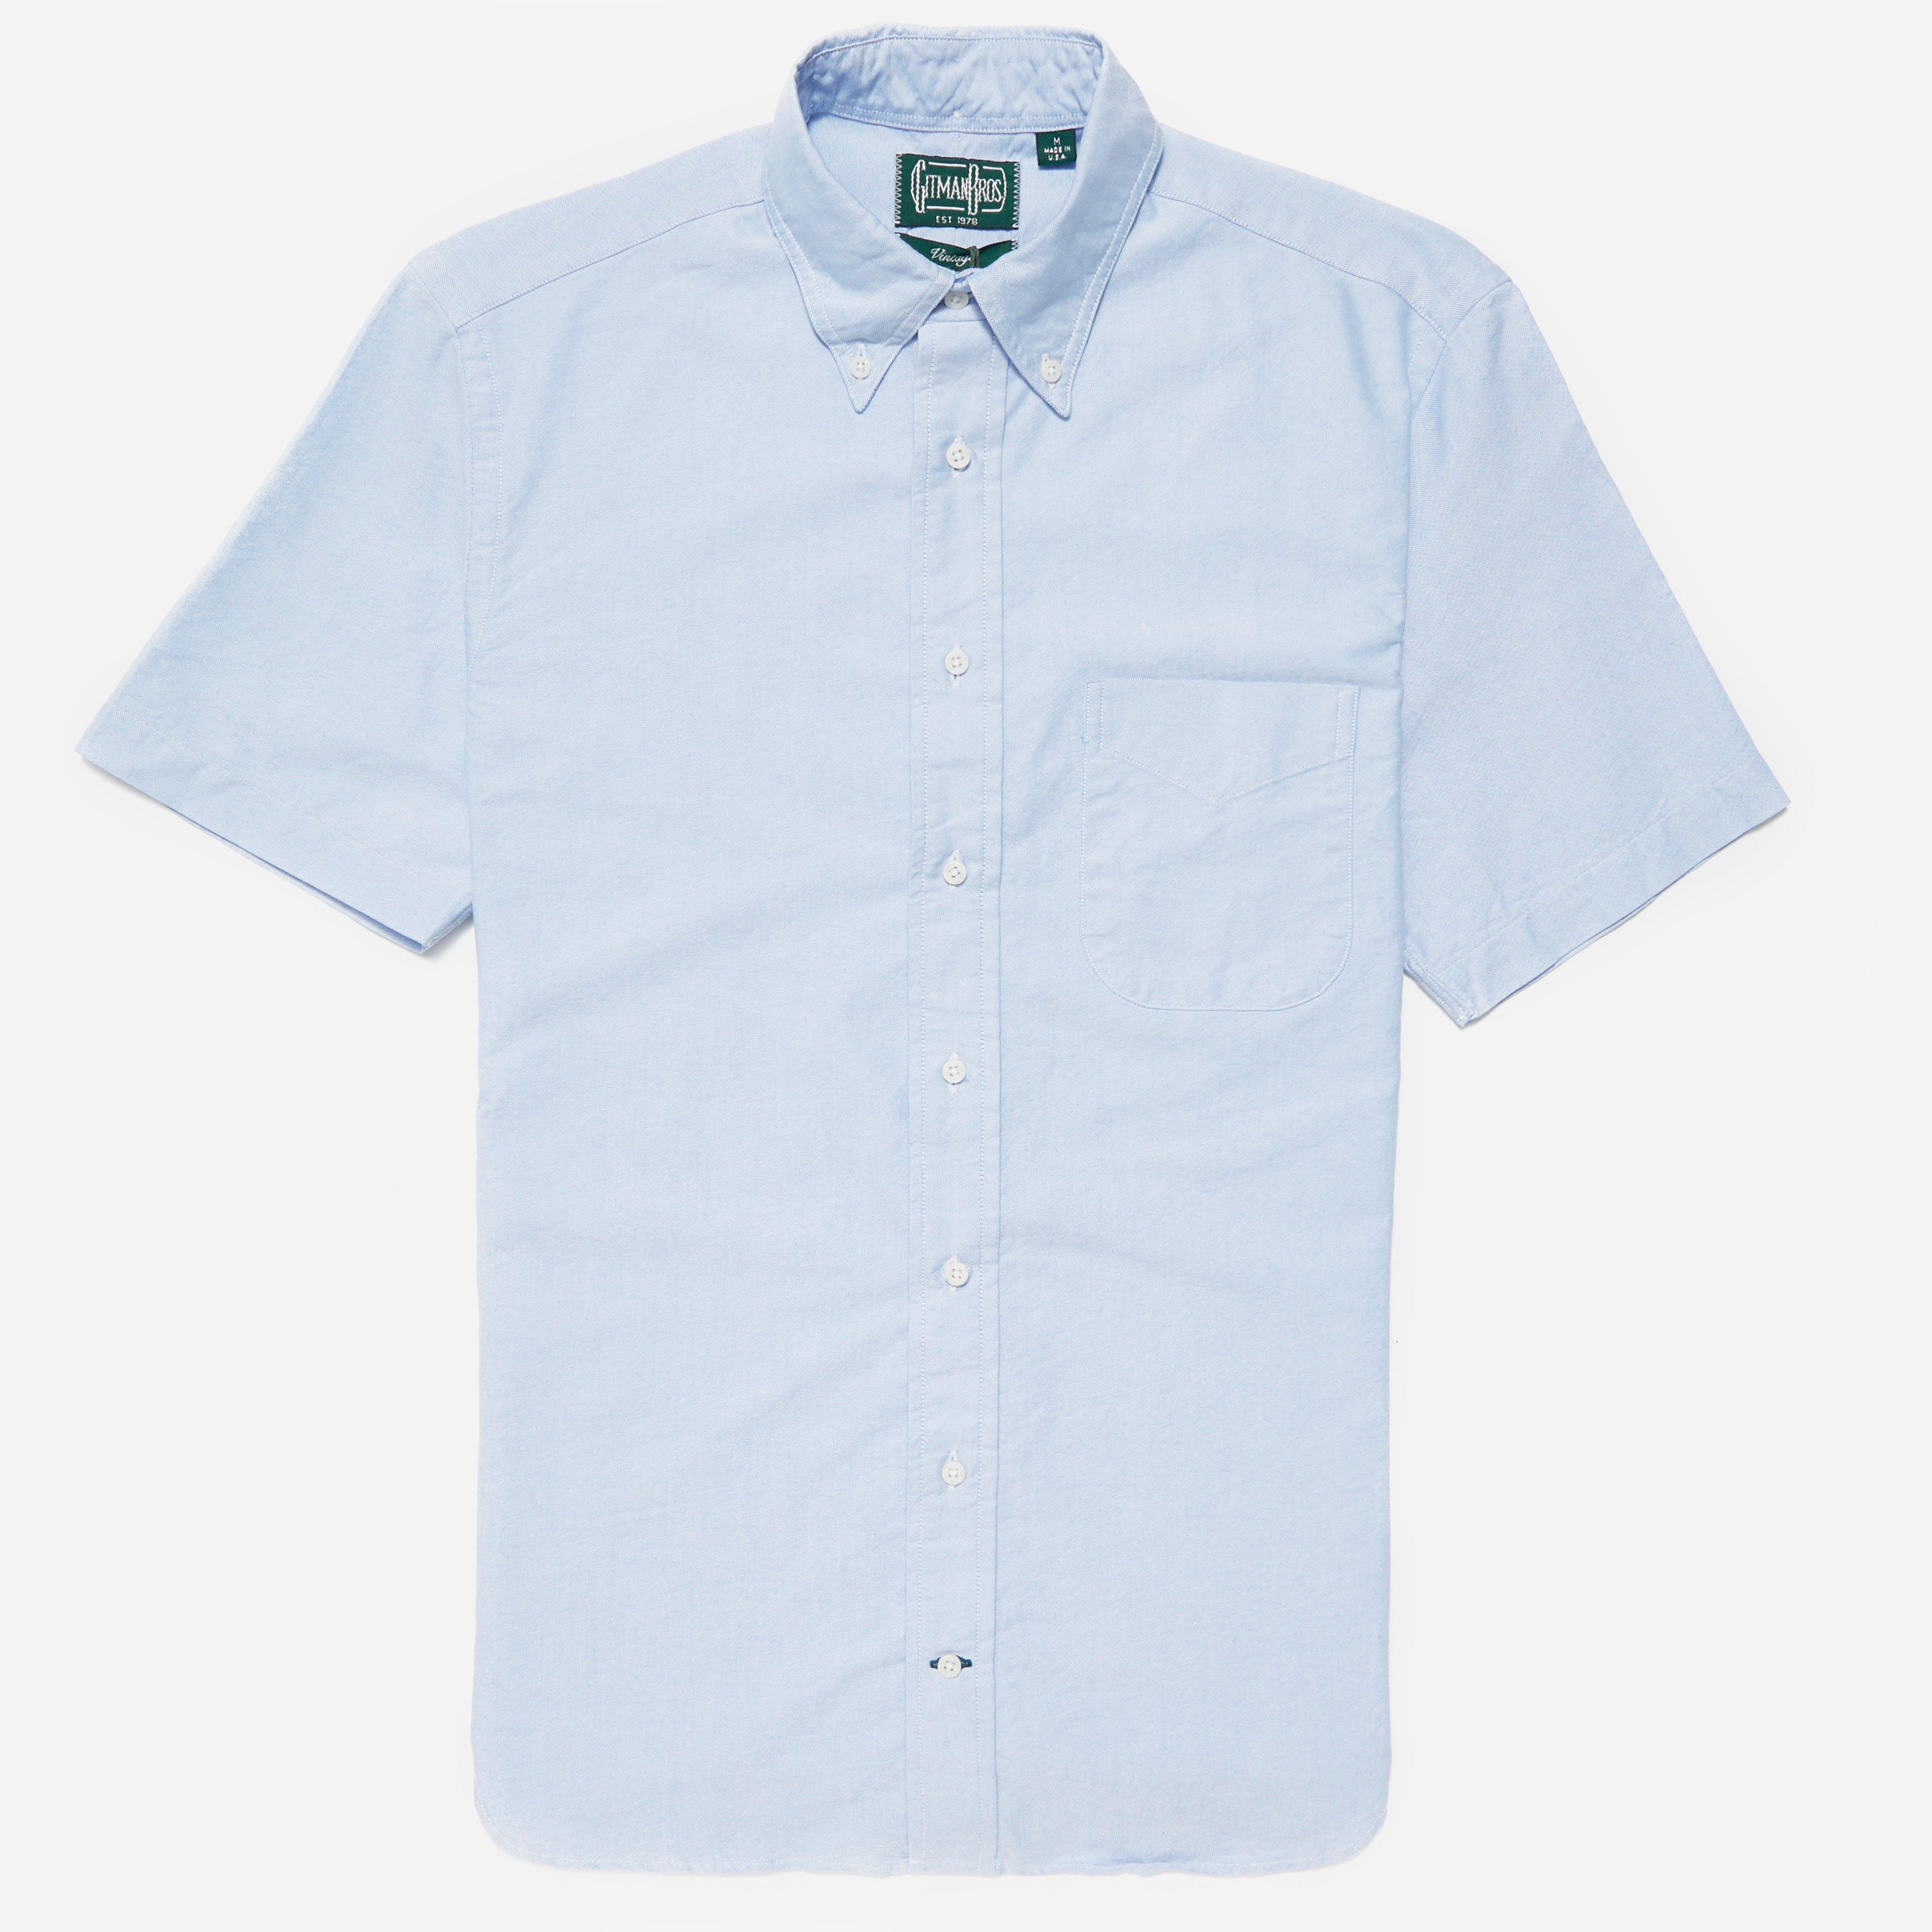 Gitman Vintage Short Sleeve Oxford BD Shirt